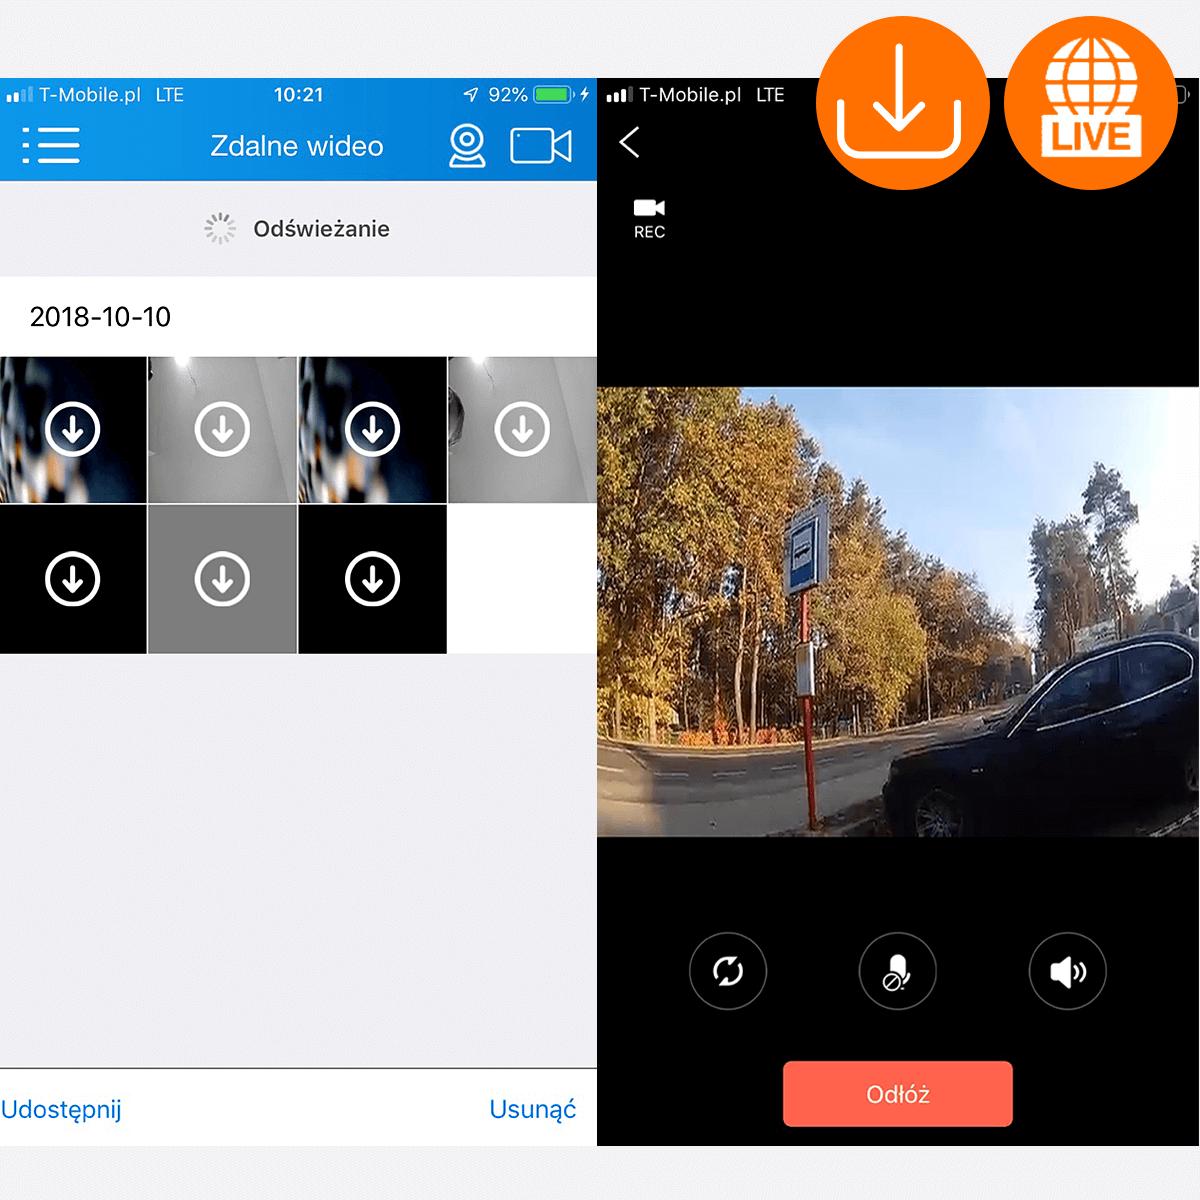 kamera do monitoringu samochodu na parkingu orllo.pl